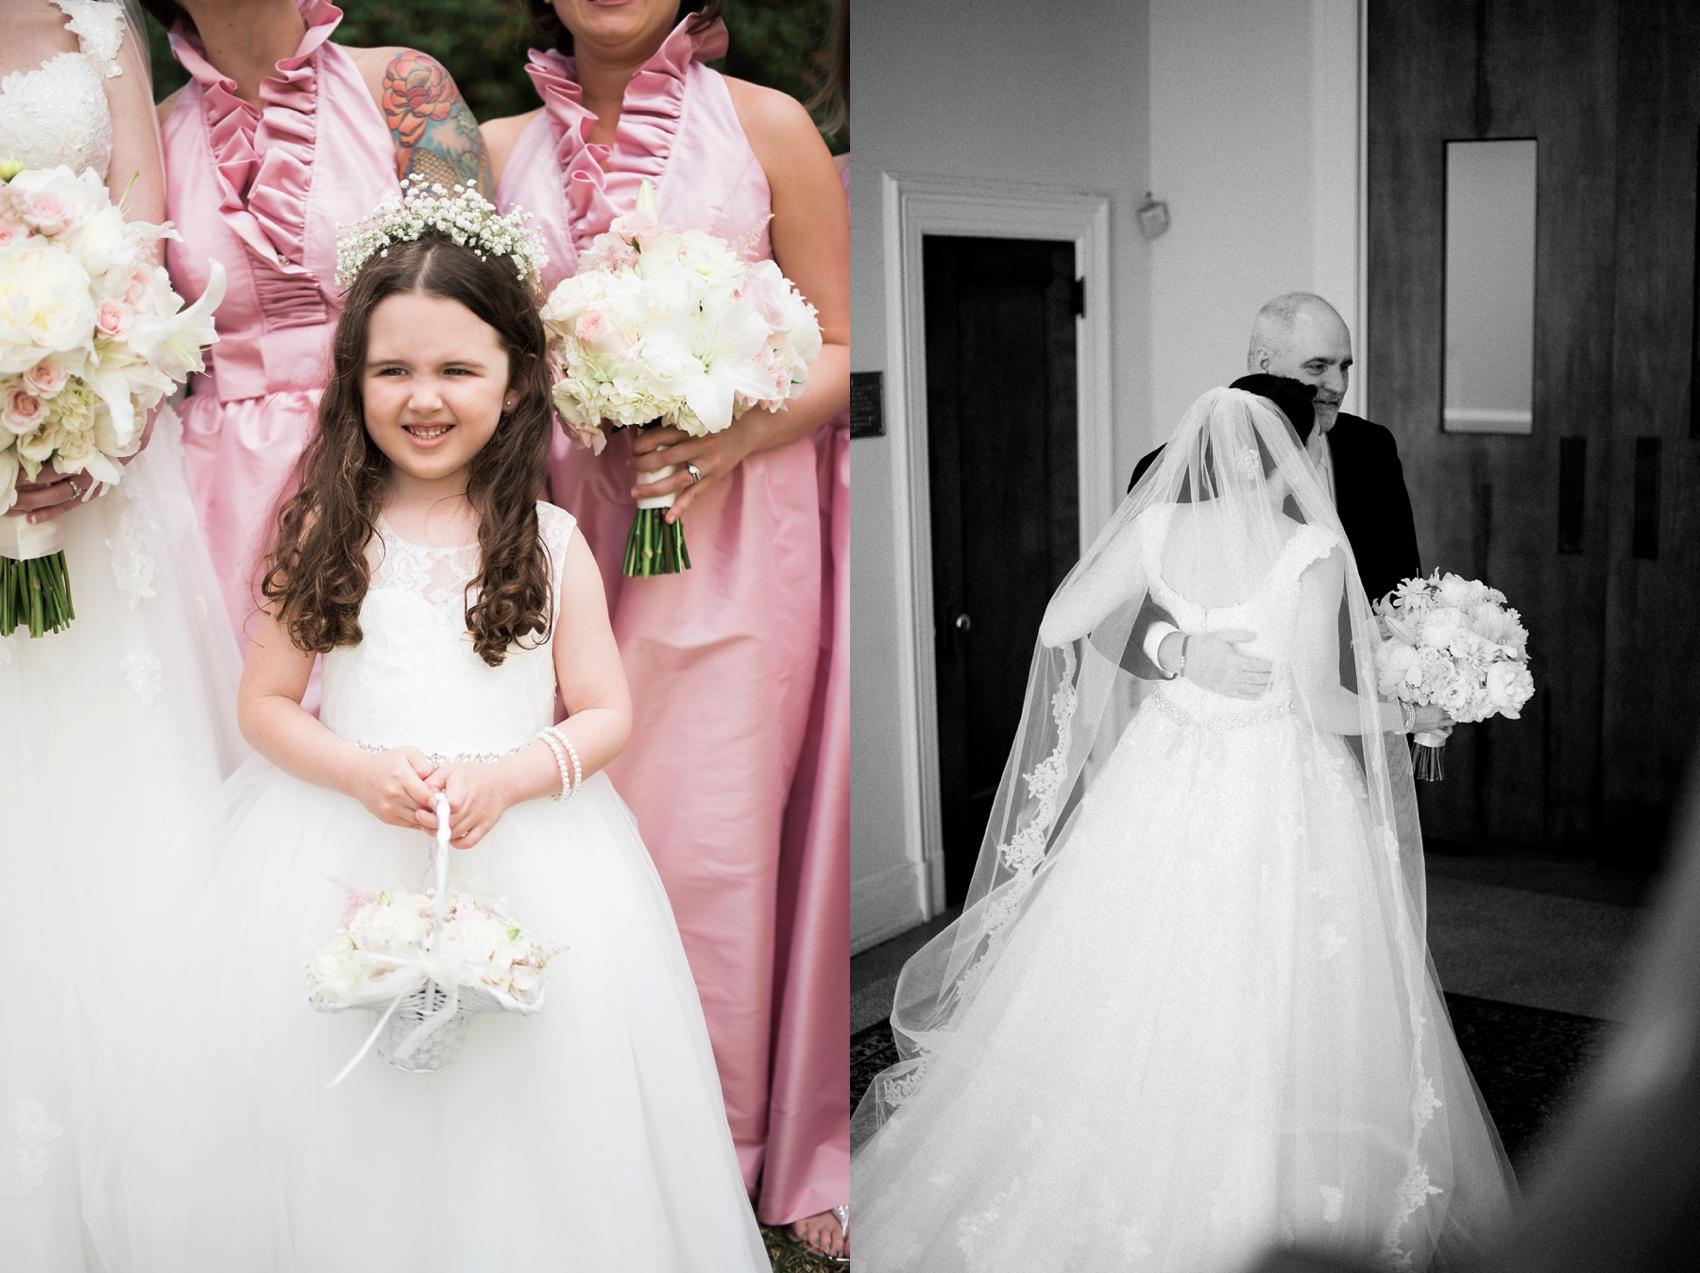 augusta_wedding_photographer_0021.jpg